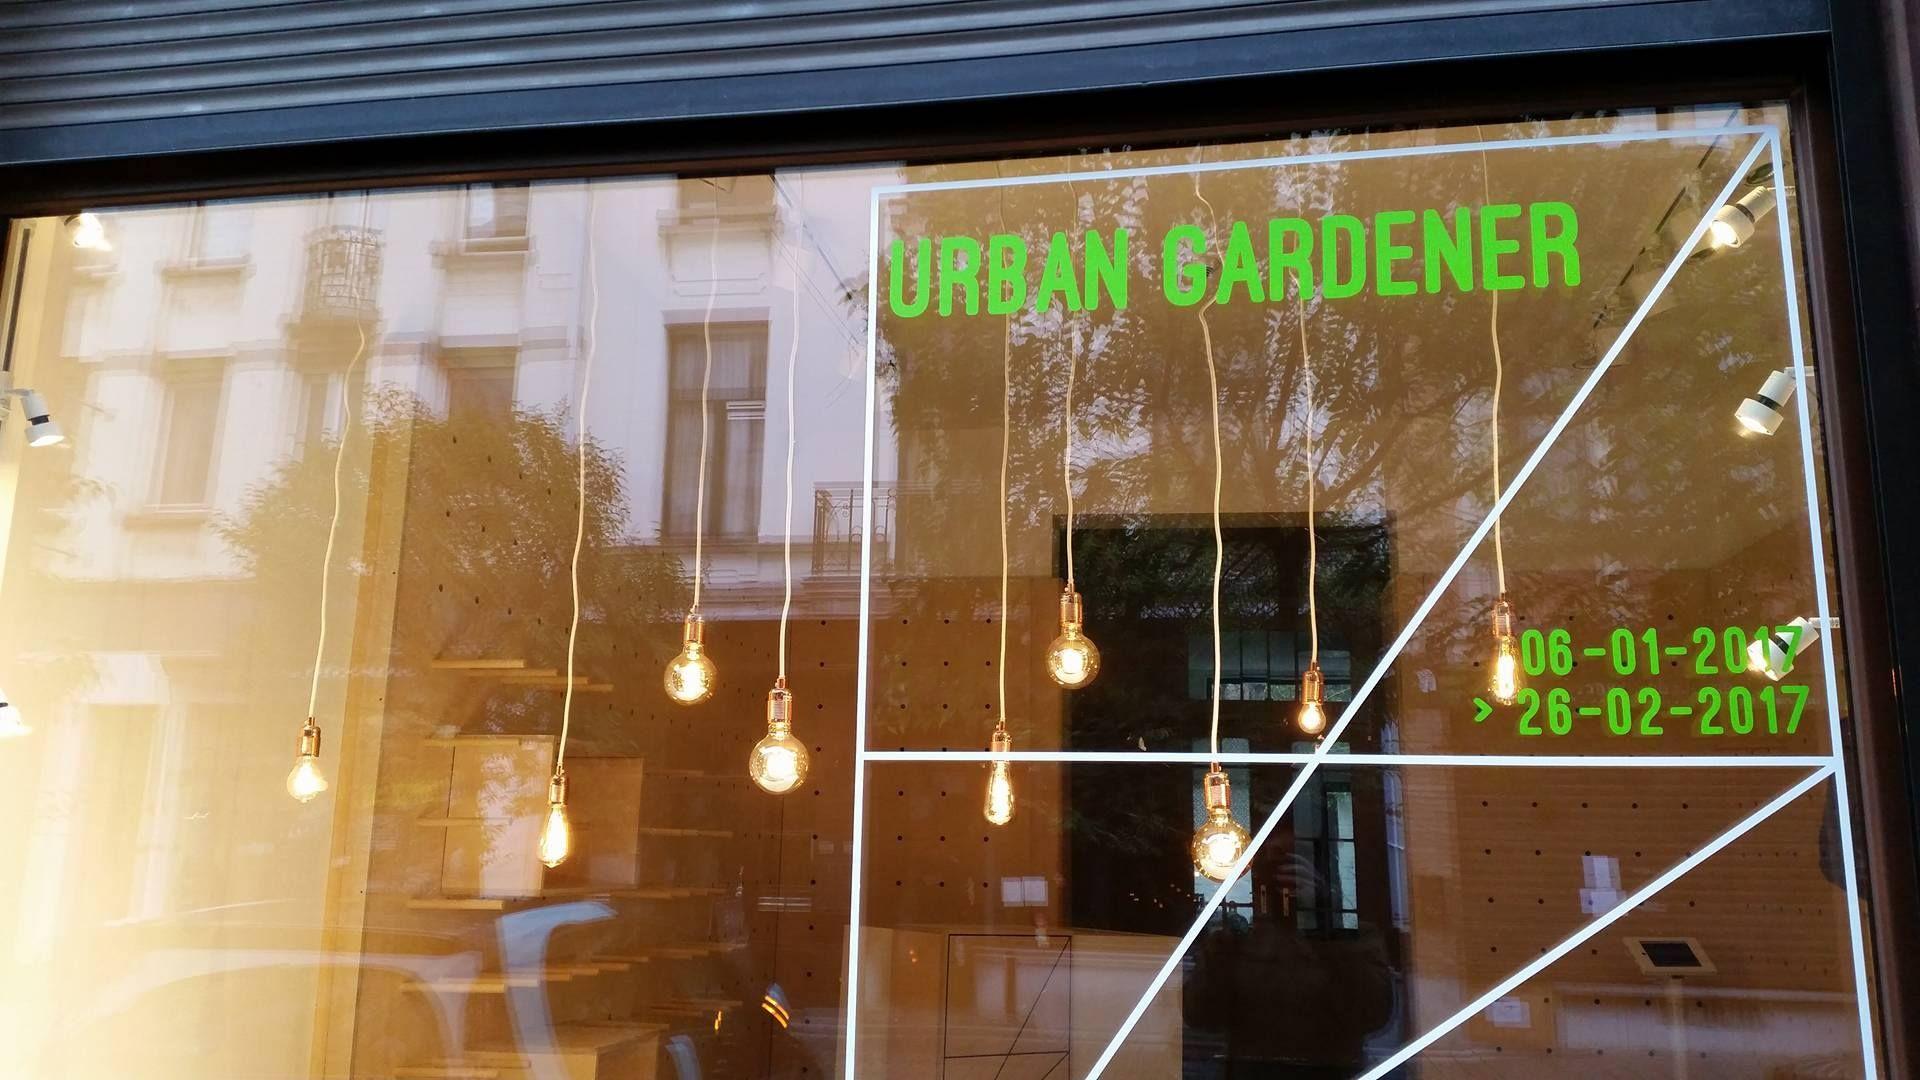 Urban Gardener - Brussels - 331 Chaussée de Wavre, 1040 ETTERBEEK (L ...